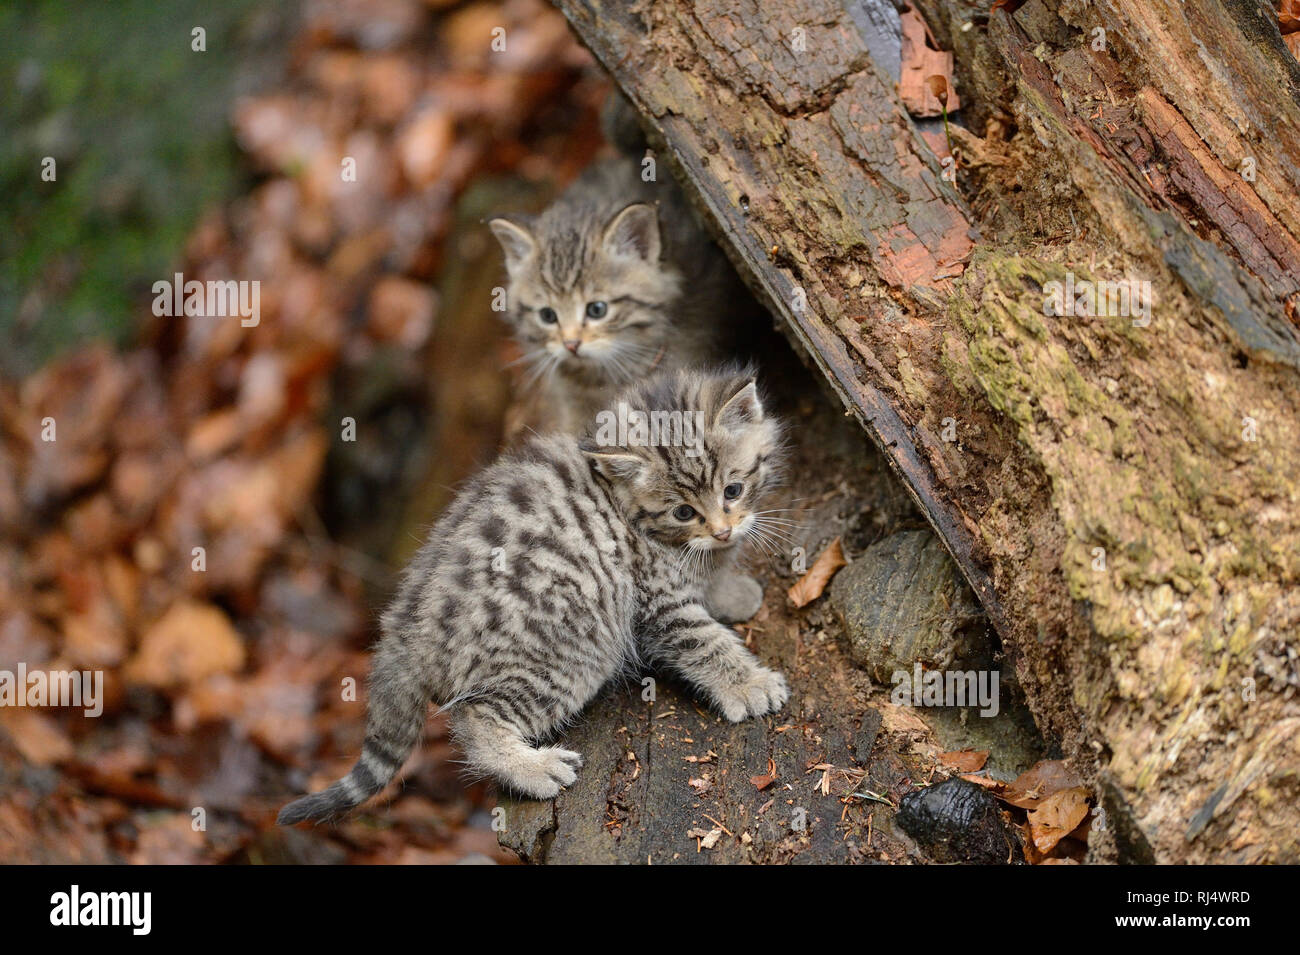 Europ?ische Wildkatzen, Felis silvestris silvestris, Jungtiere, Blick Kamera - Stock Image